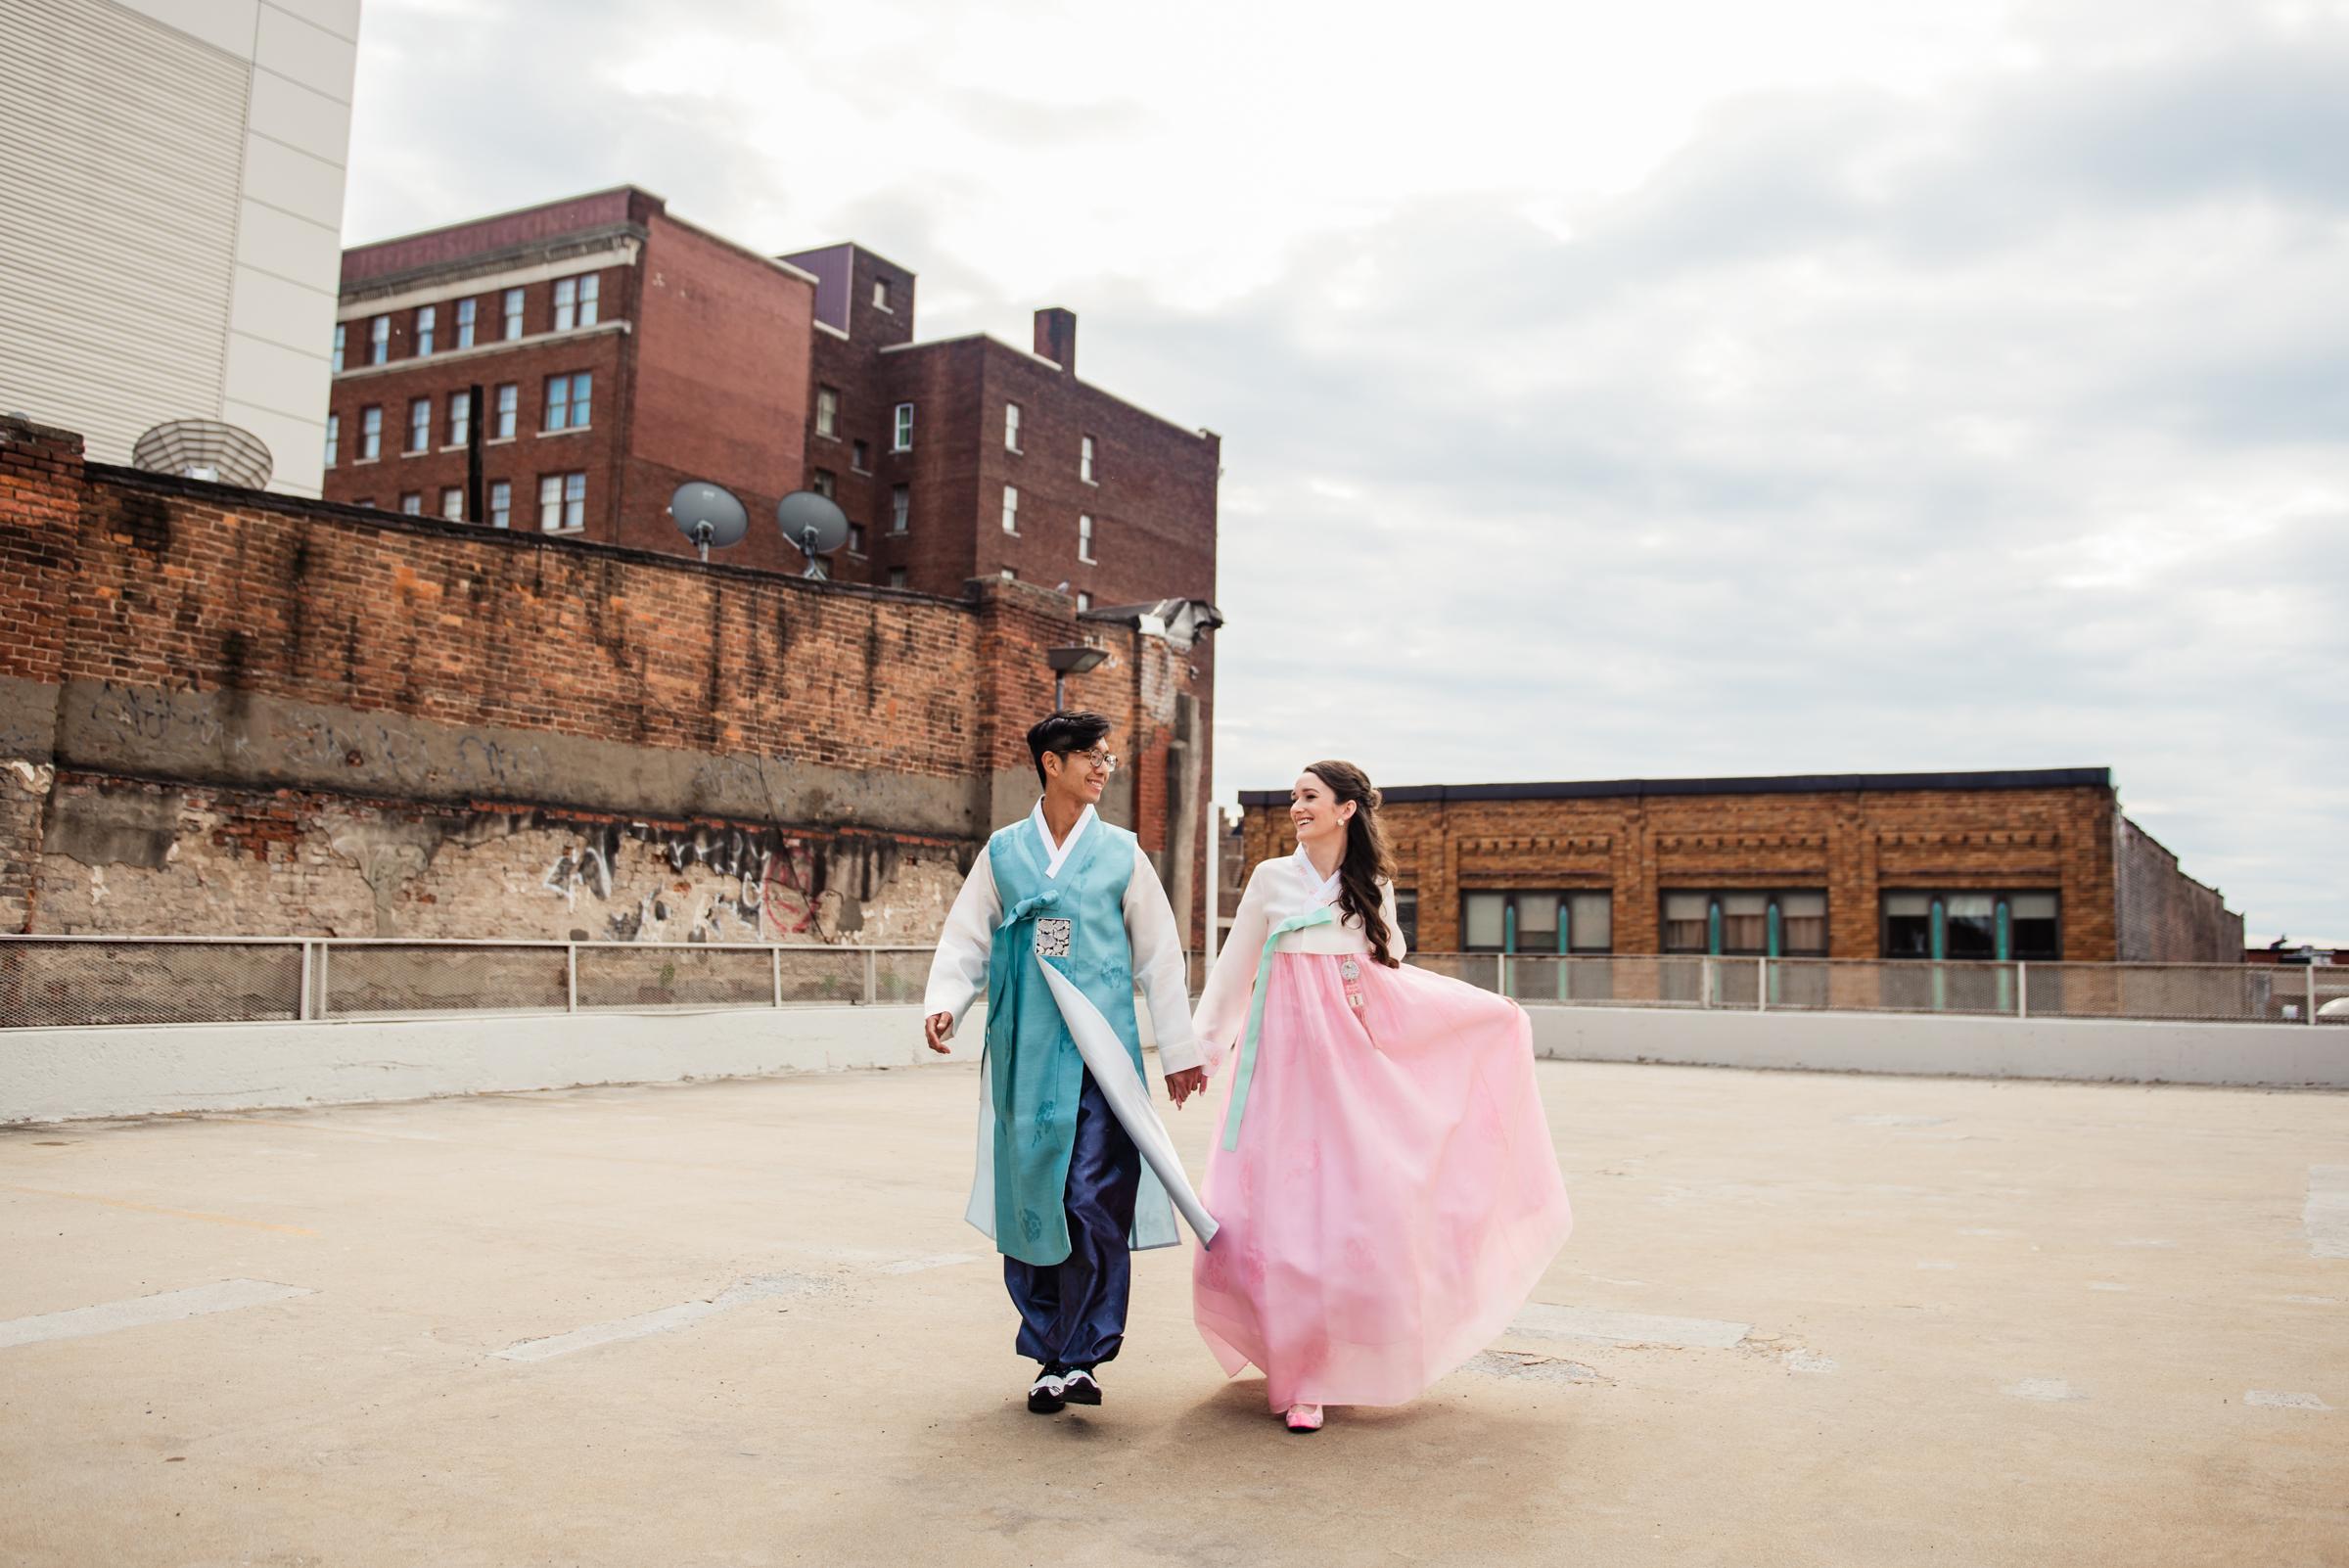 SKY_Armory_Syracuse_Wedding_JILL_STUDIO_Rochester_NY_Photographer_DSC_5618.jpg